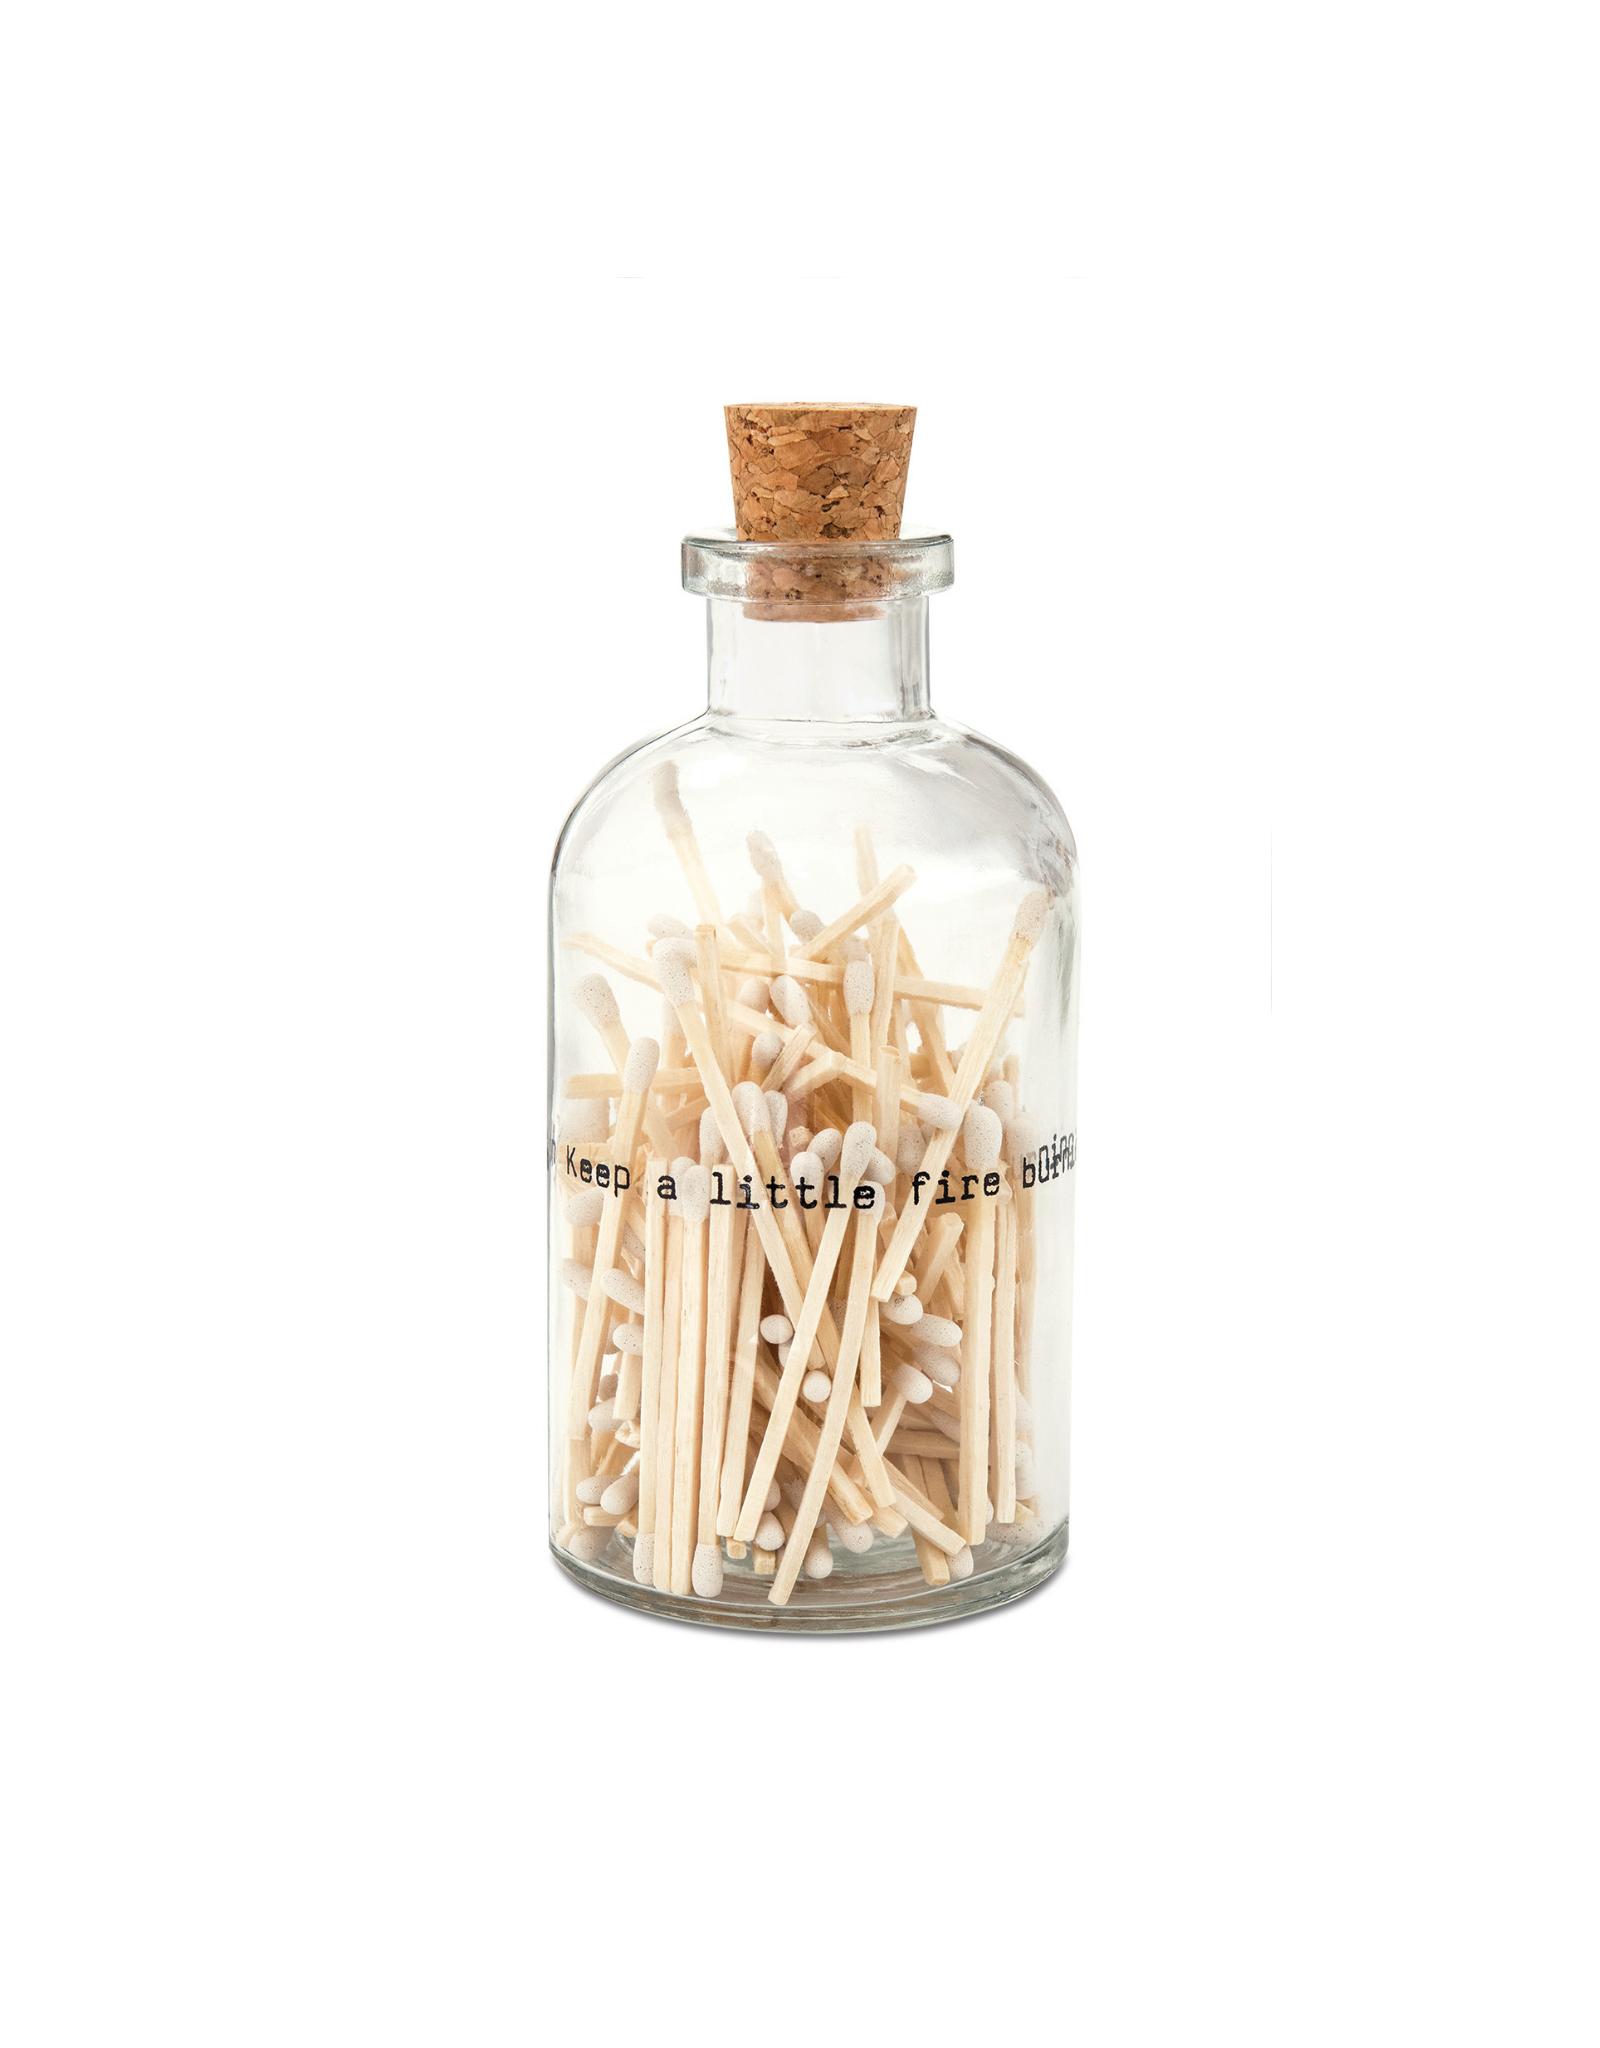 Skeem Design Apothecary Match Bottle